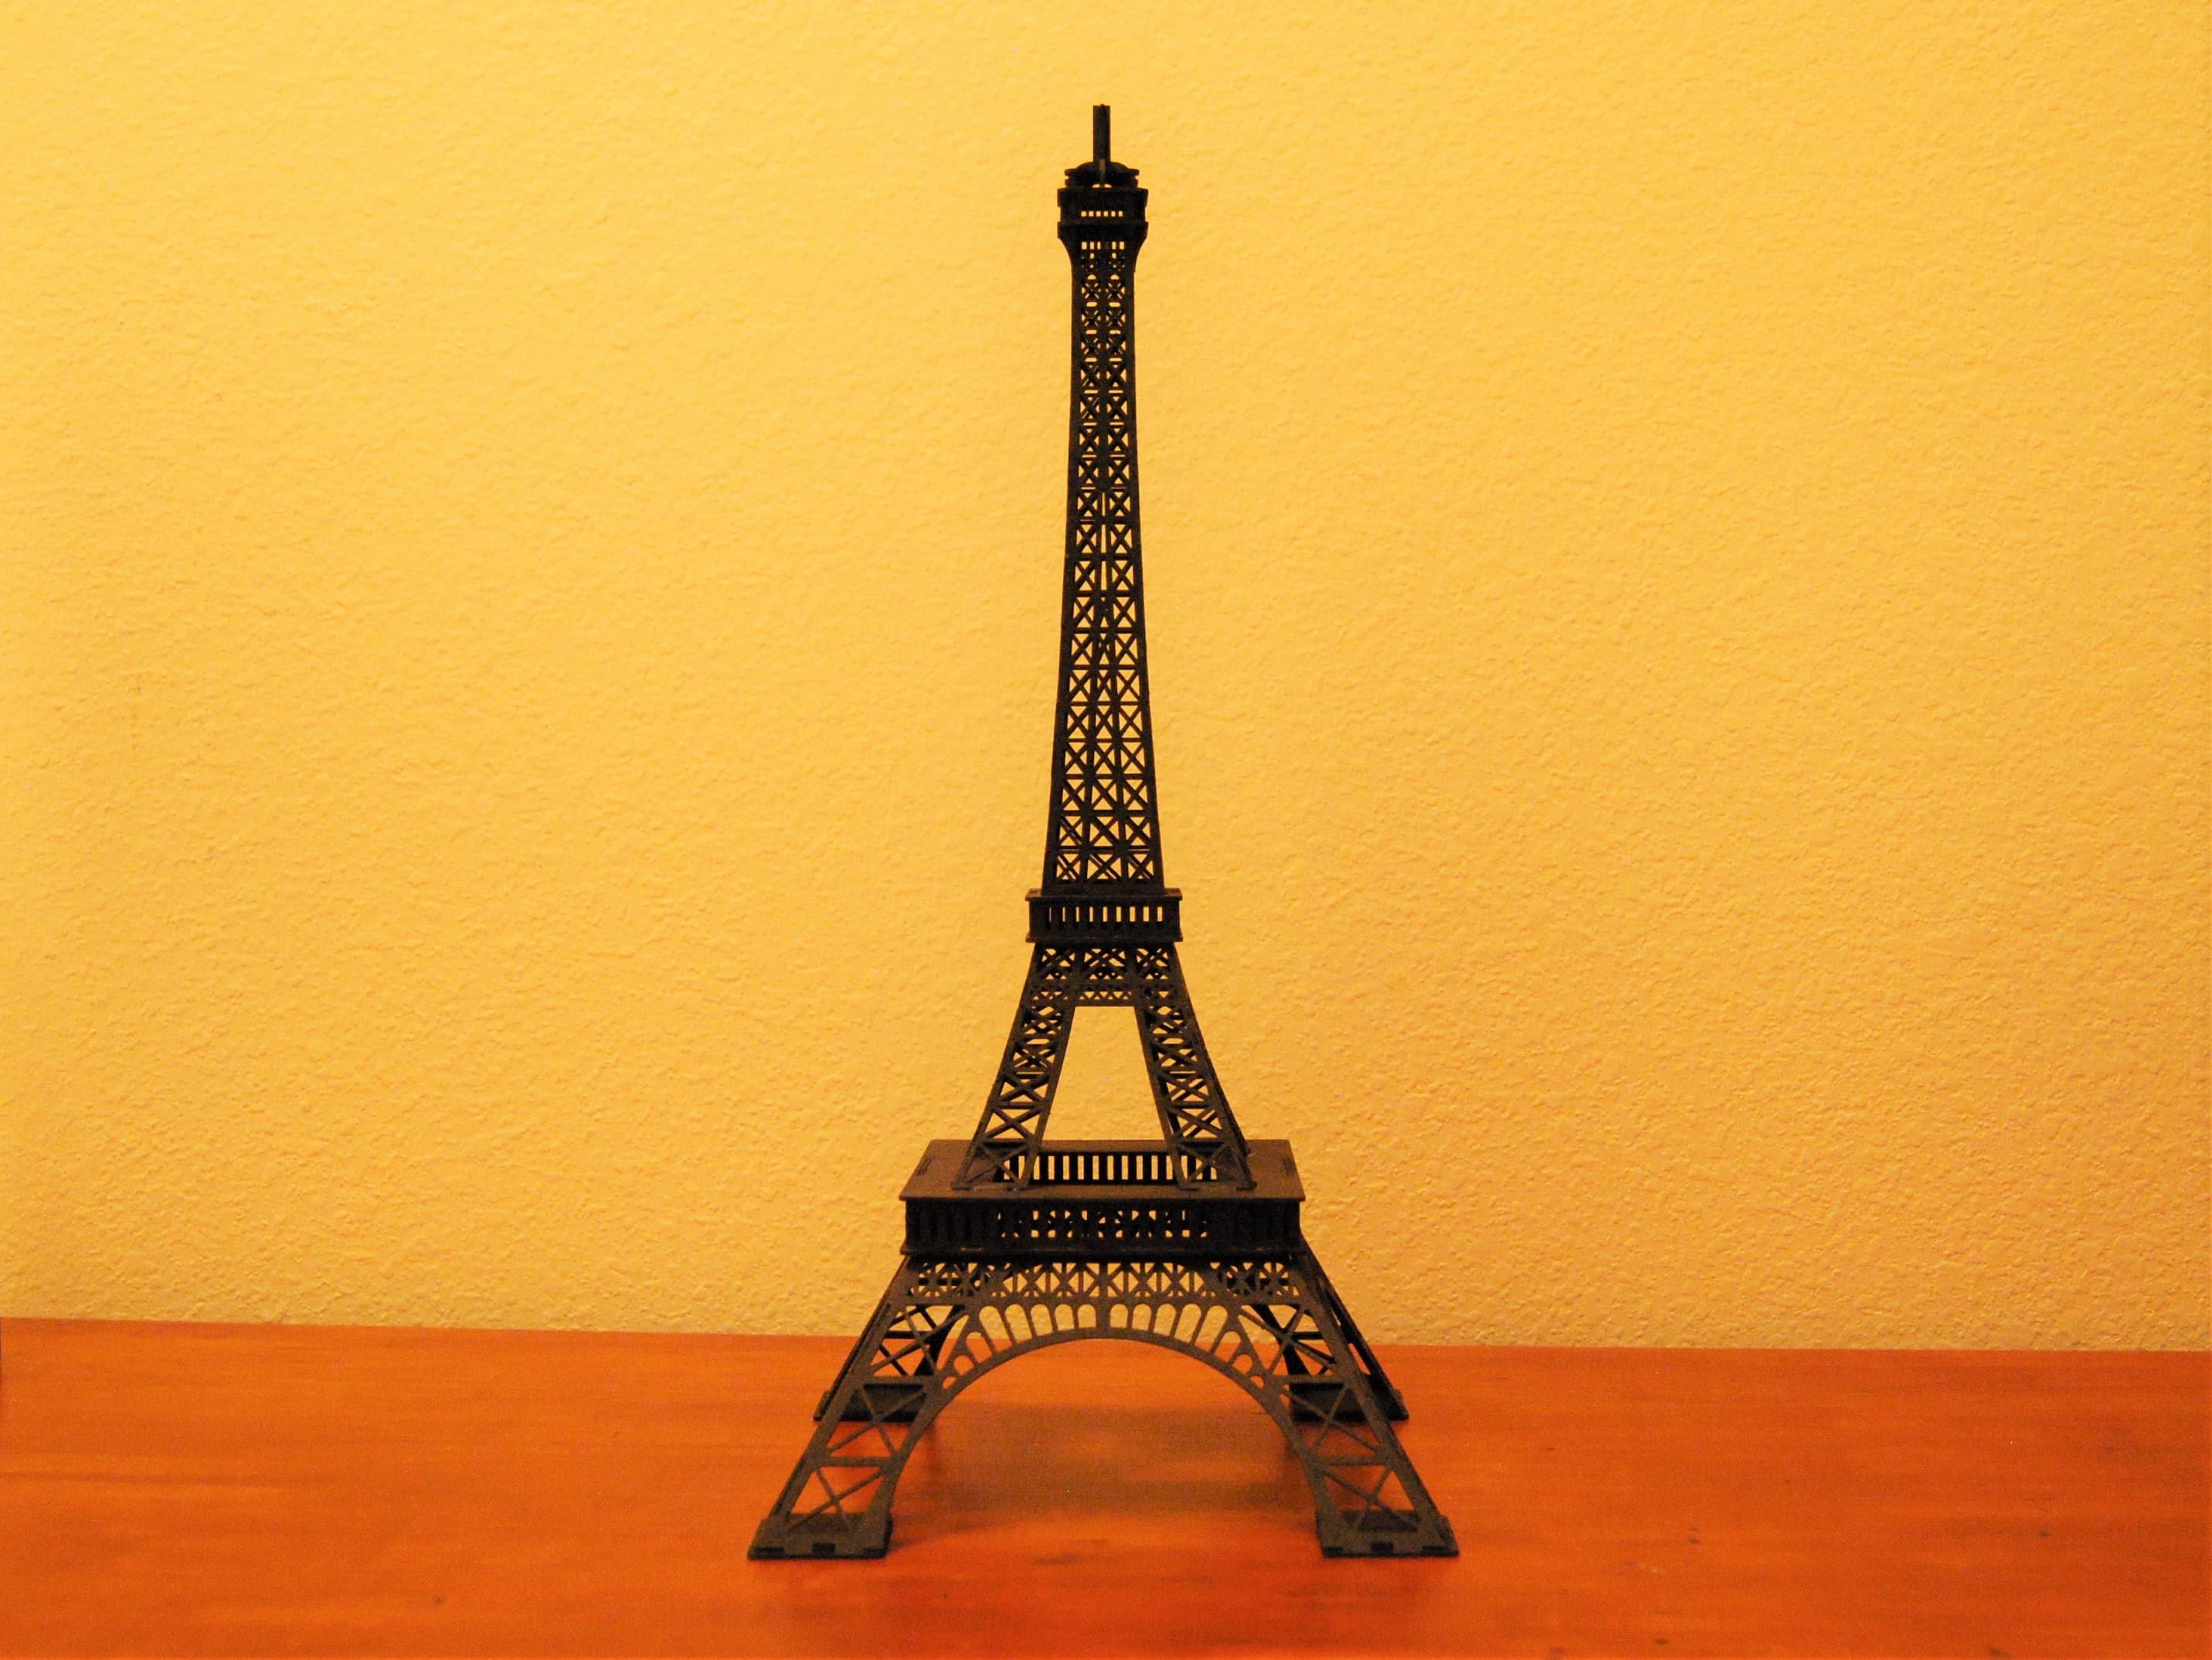 Eiffel Tower Replica Centerpiece 15 Inch Tall Black | Etsy